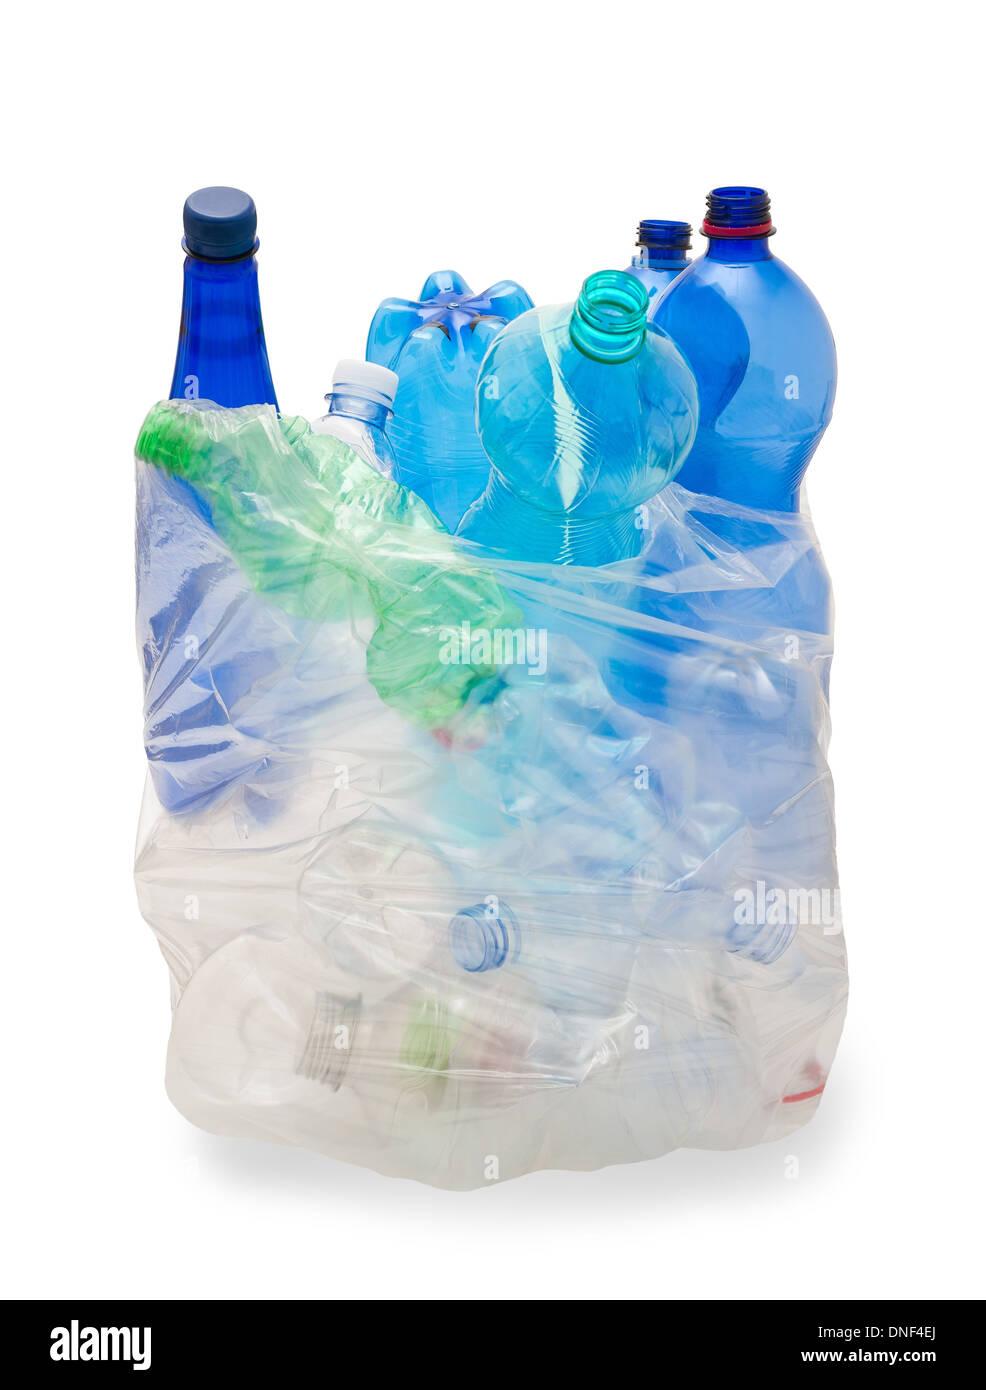 garbage bag with plastic bottles - Stock Image